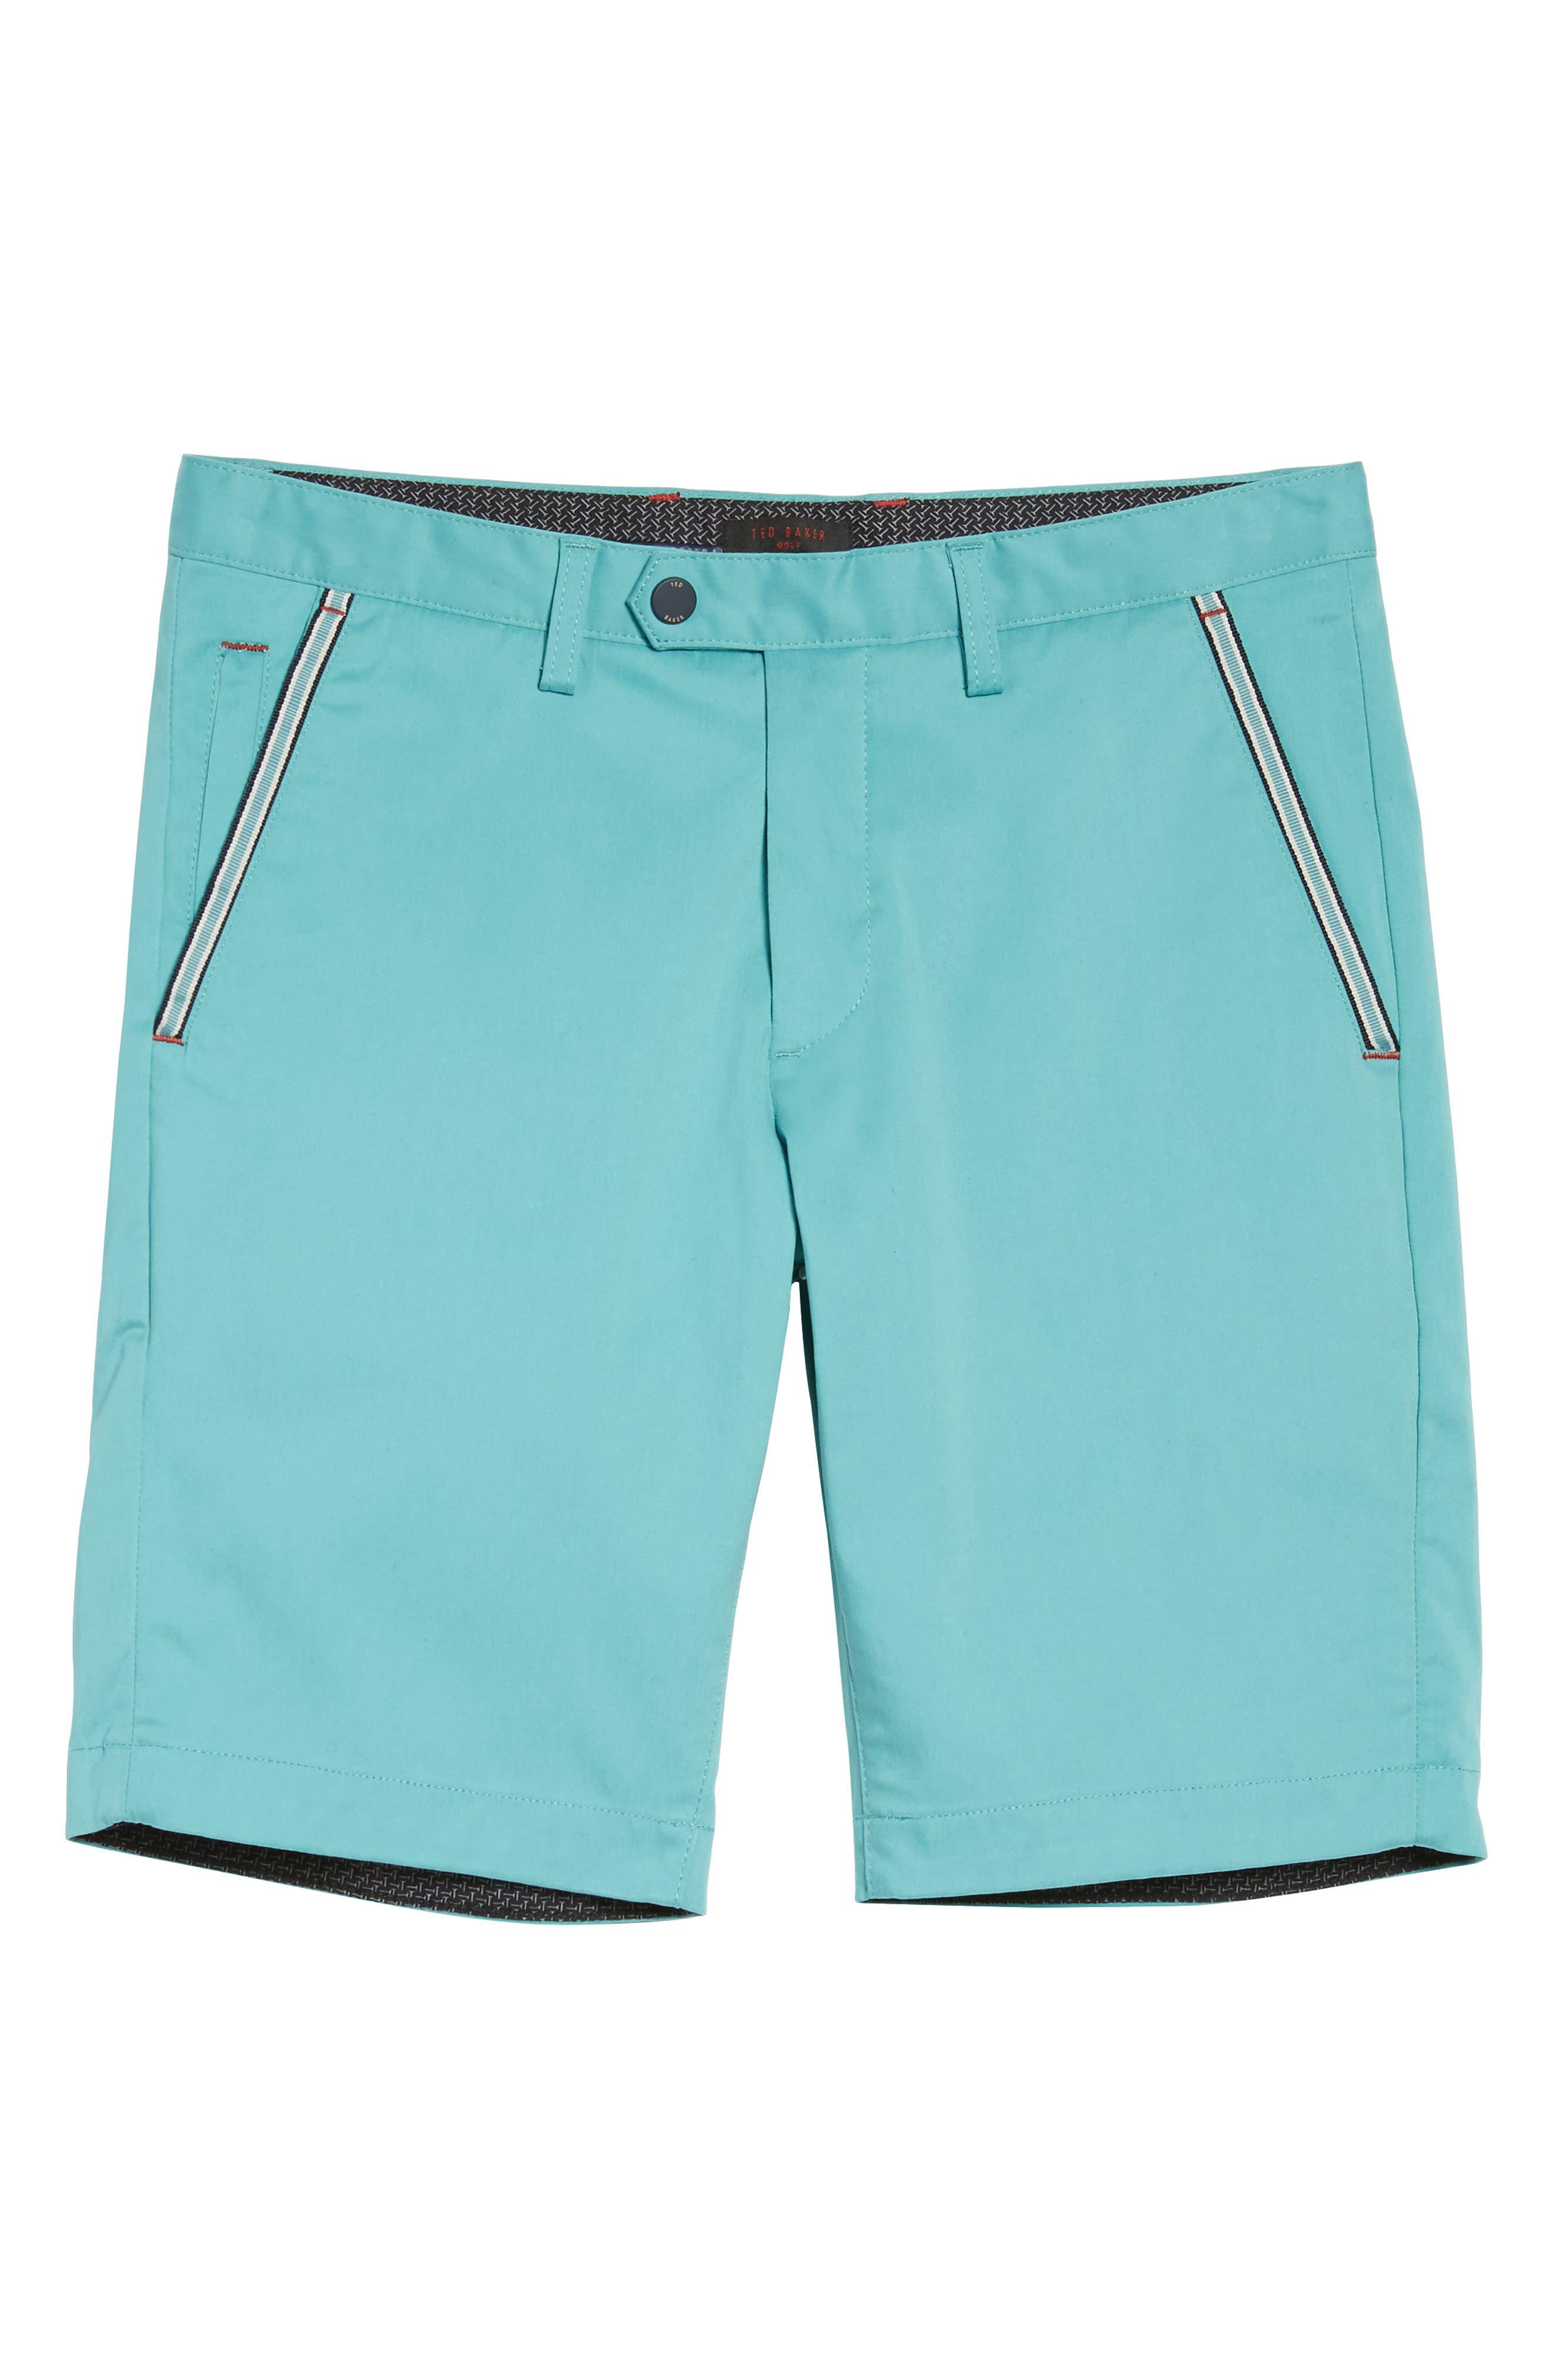 Golf Shorts,                             Alternate thumbnail 16, color,